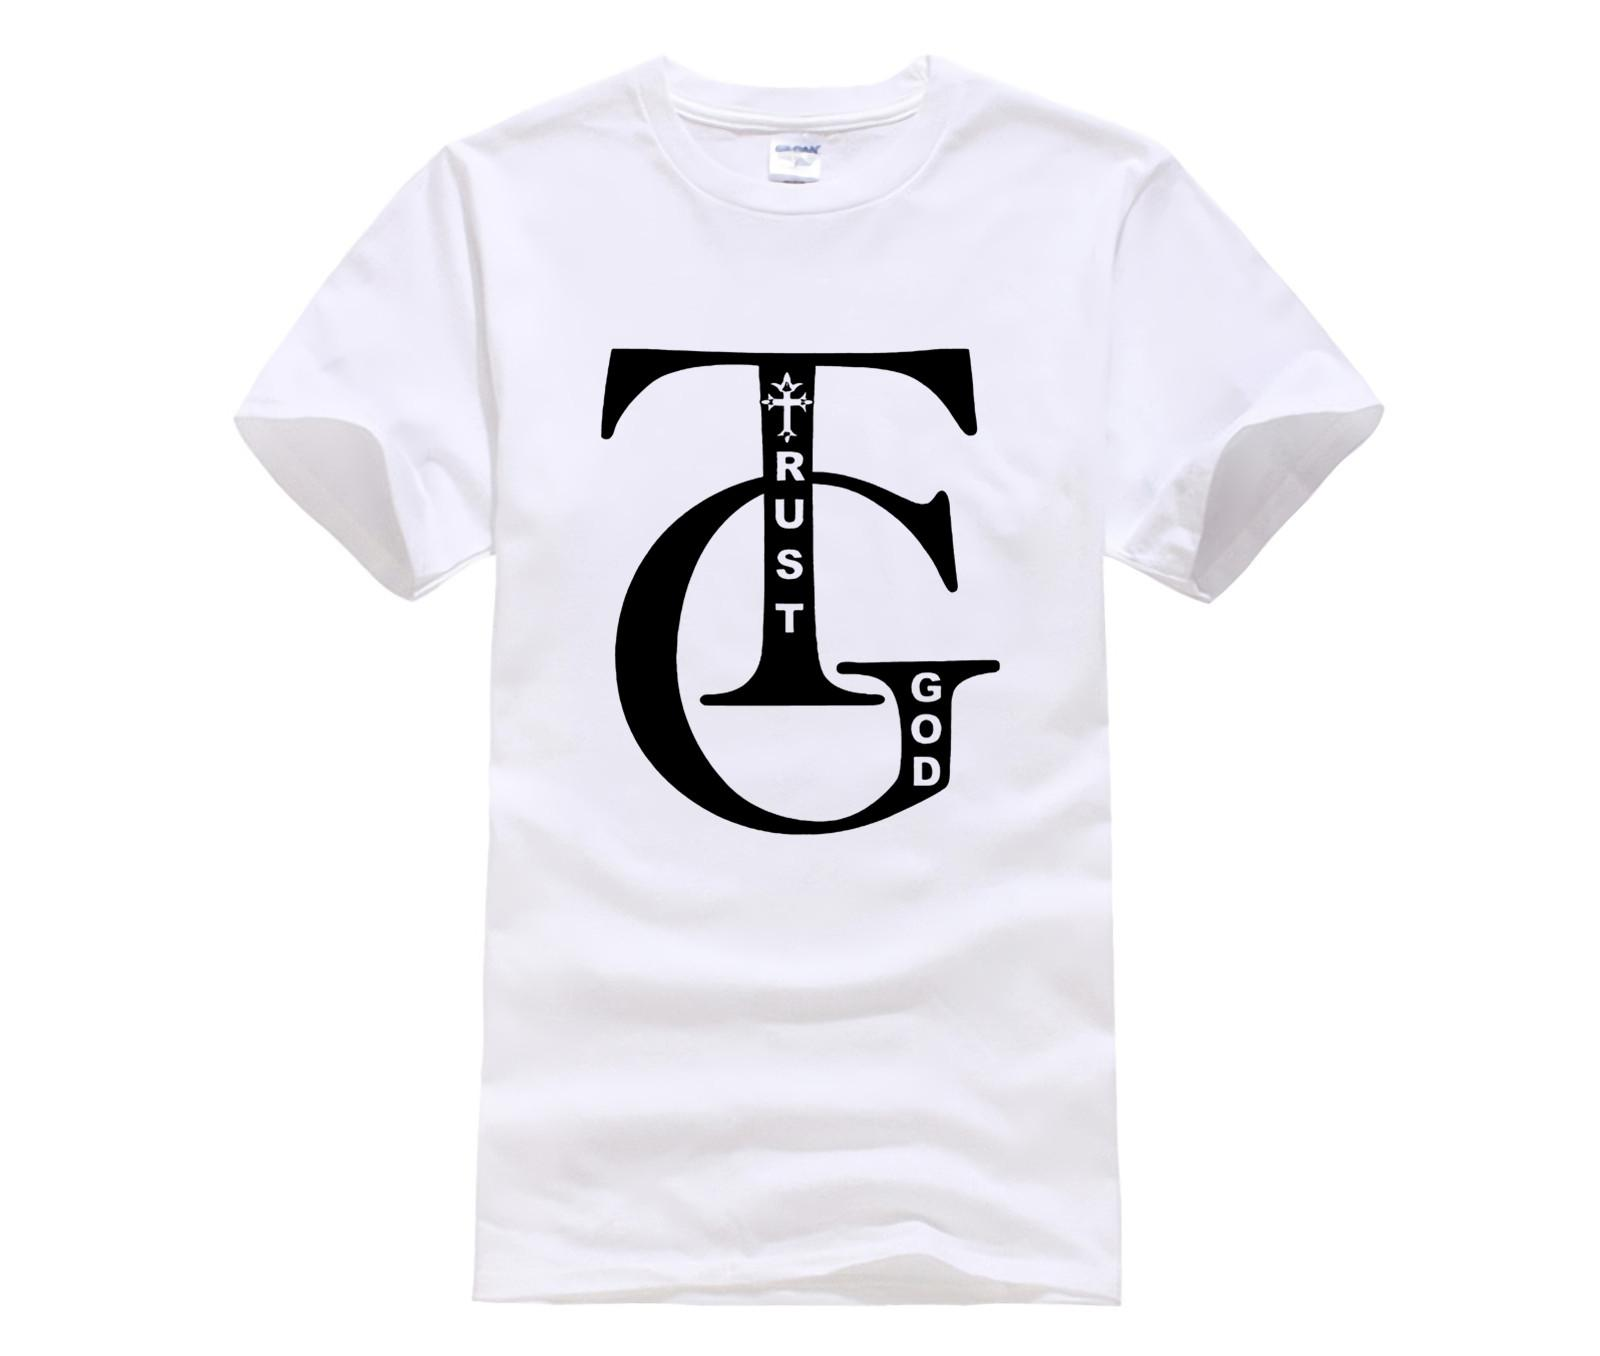 Summer Fashion Street с коротким рукавом Футболка доверия бог псалом 910 мужские премиум Мужская мода 2020 Стиль T Shirt